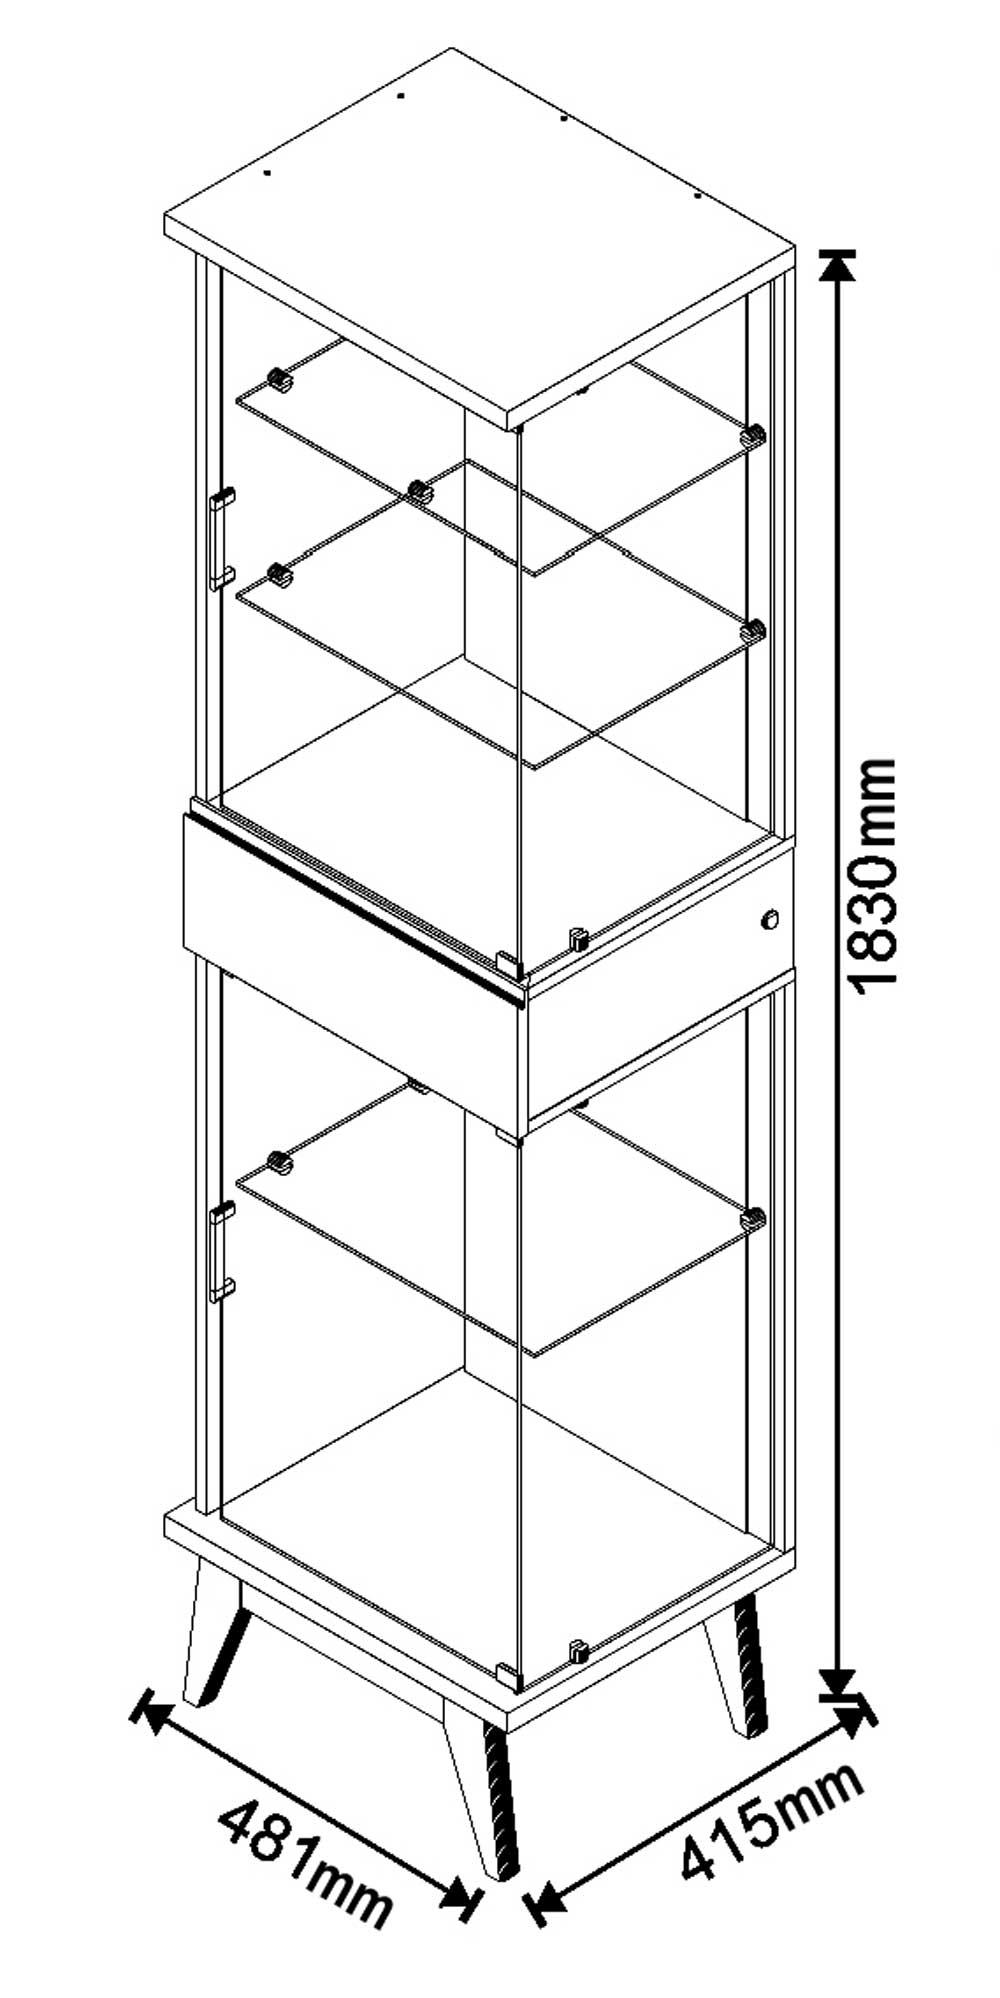 Conjunto Sala de Estar Buffet + Aparador + Cristaleiras 1G e Nuance - Imcal Móveis